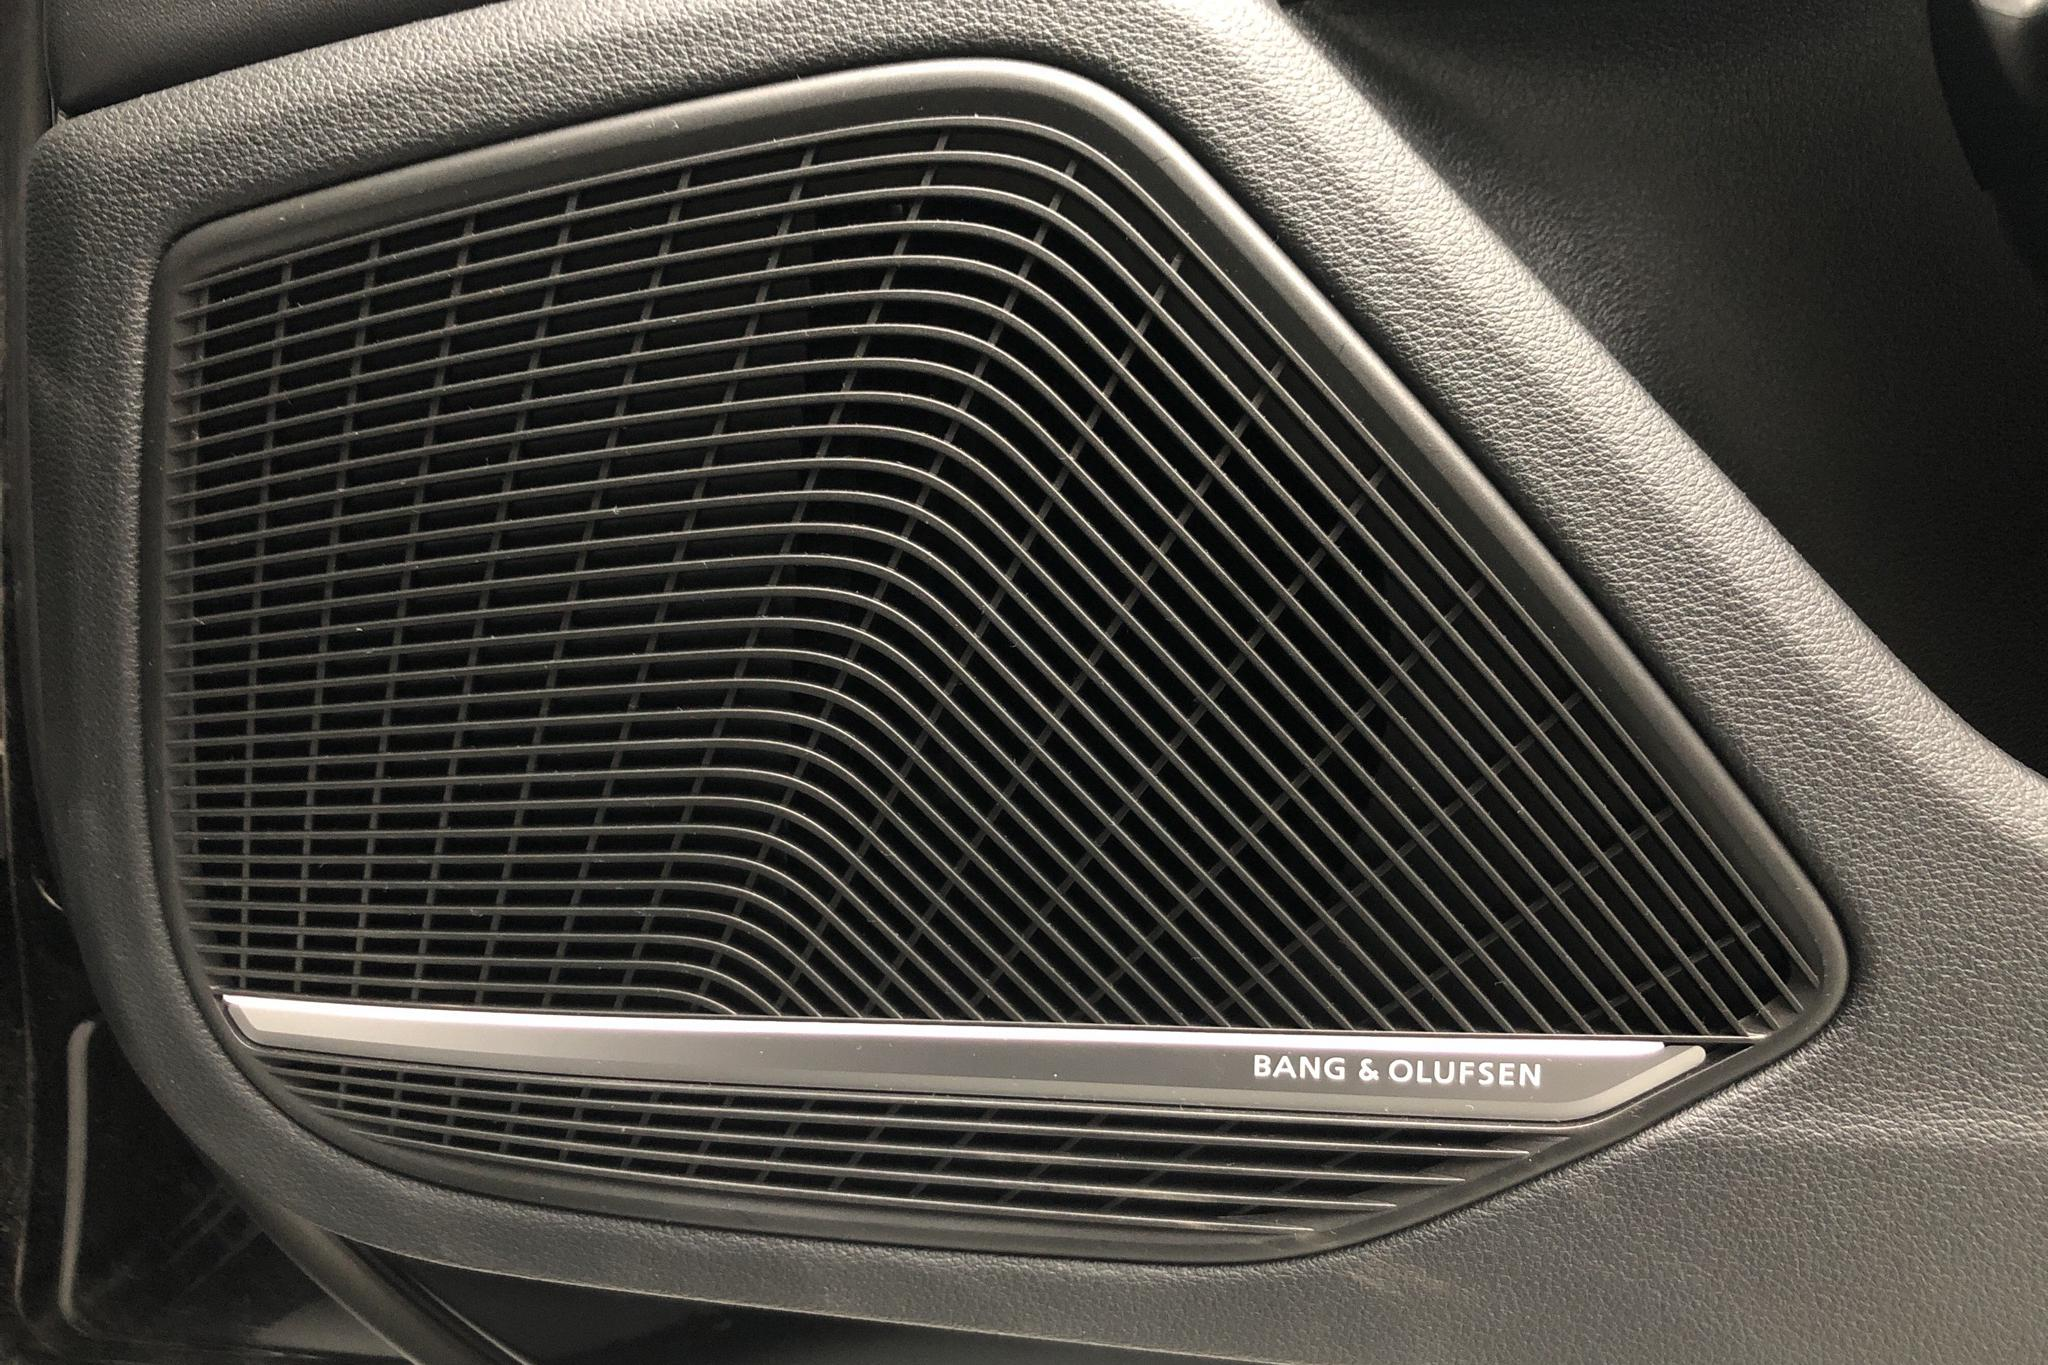 Audi A5 2.0 TFSI Coupé quattro (252hk) - 5 039 mil - Automat - svart - 2018